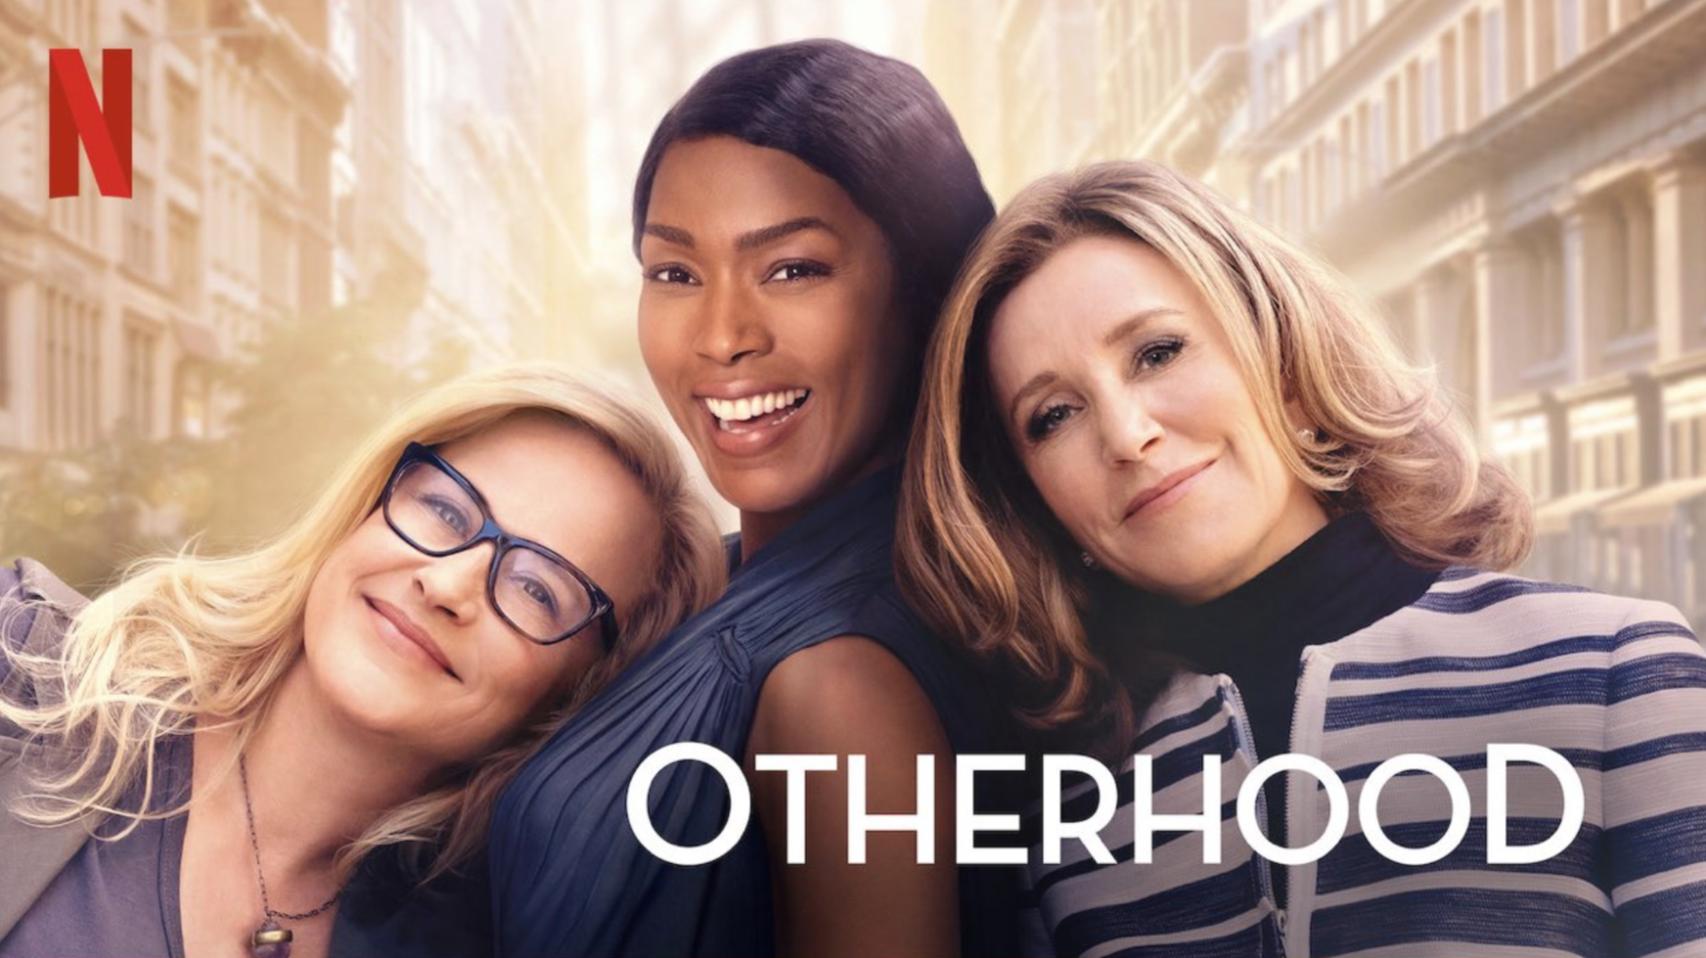 Otherhood (2019) | Oh! That Film Blog